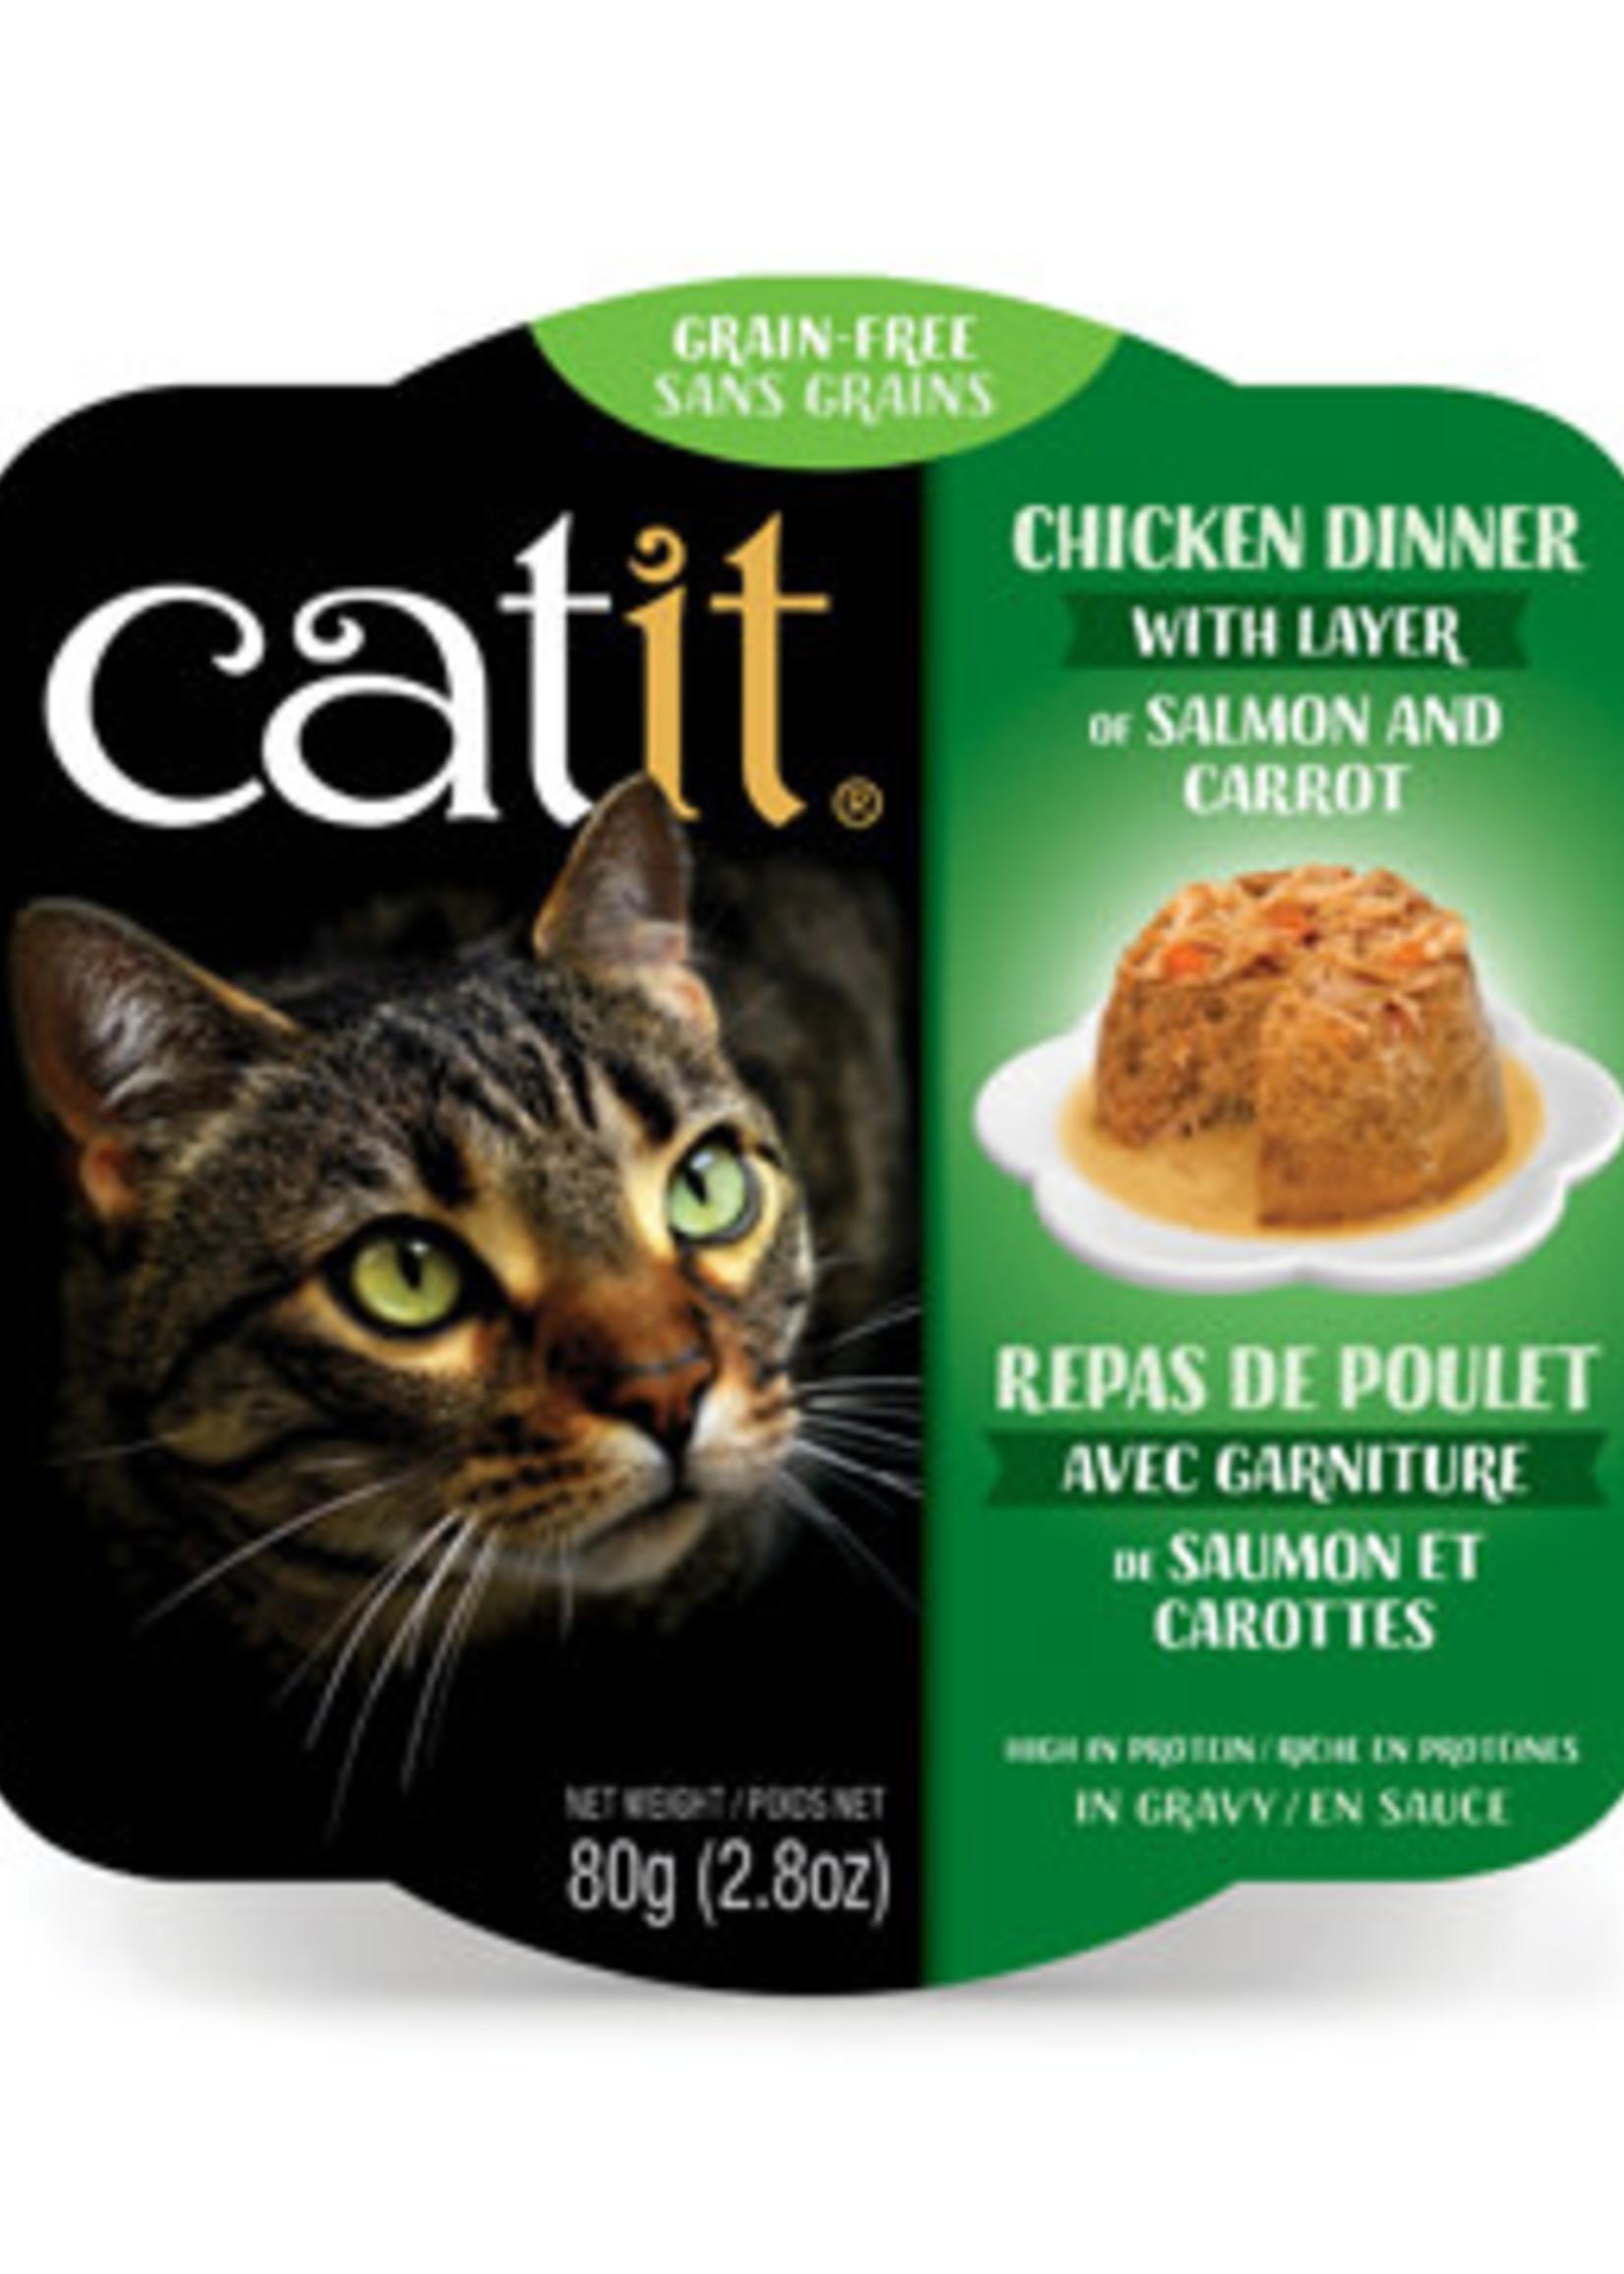 CatIt CT Chicken Dinner, Salmon & Carrot,80g